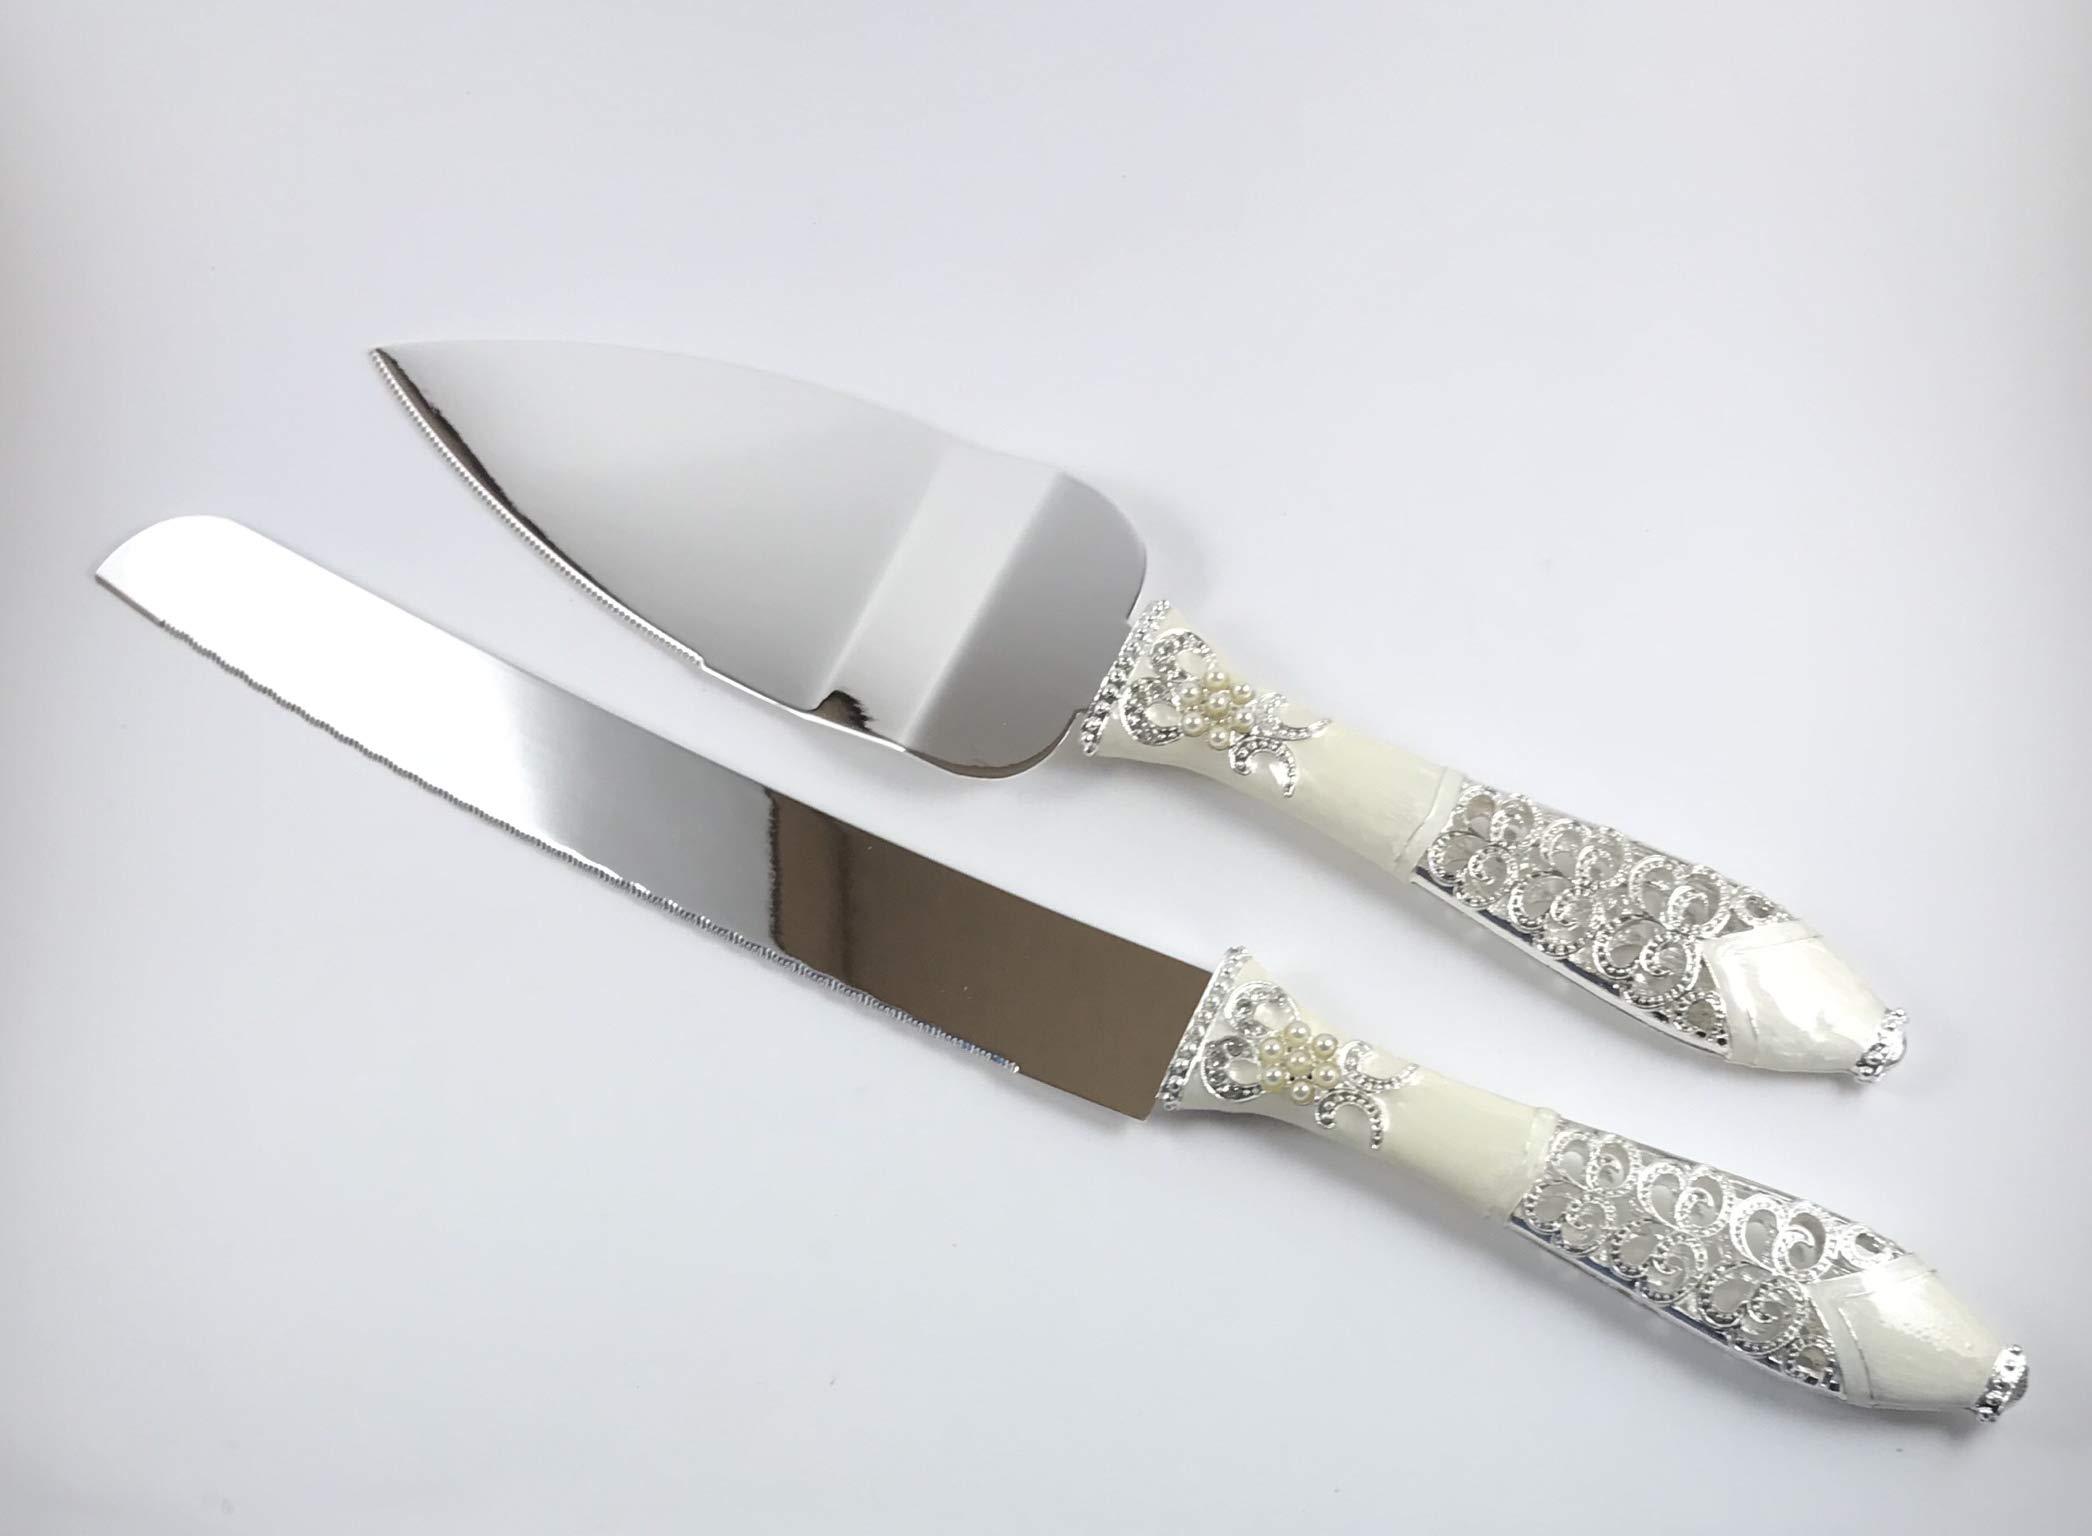 Wedding Cake Knife and Server Set – Knives for Wedding Cakes – Wedding Cutting Cake Set – Practical Knives for Cutting Wedding Cakes – Serving Utensils – Cake Servers